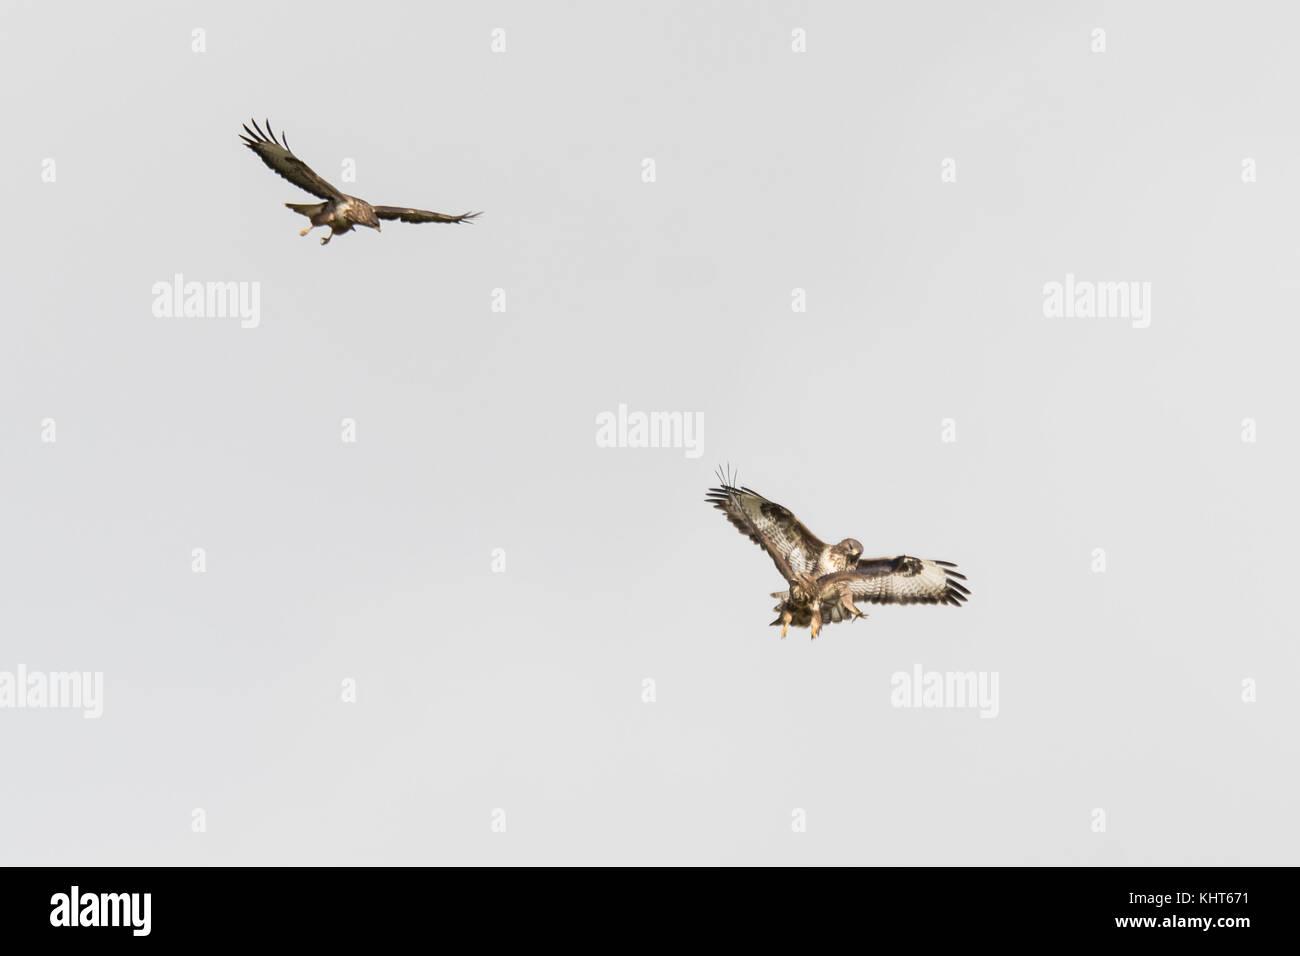 Pair of buzzards (Buteo buteo) attacking juvenile intruder. Territorial birds of prey engaging unwelcome trespasser - Stock Image